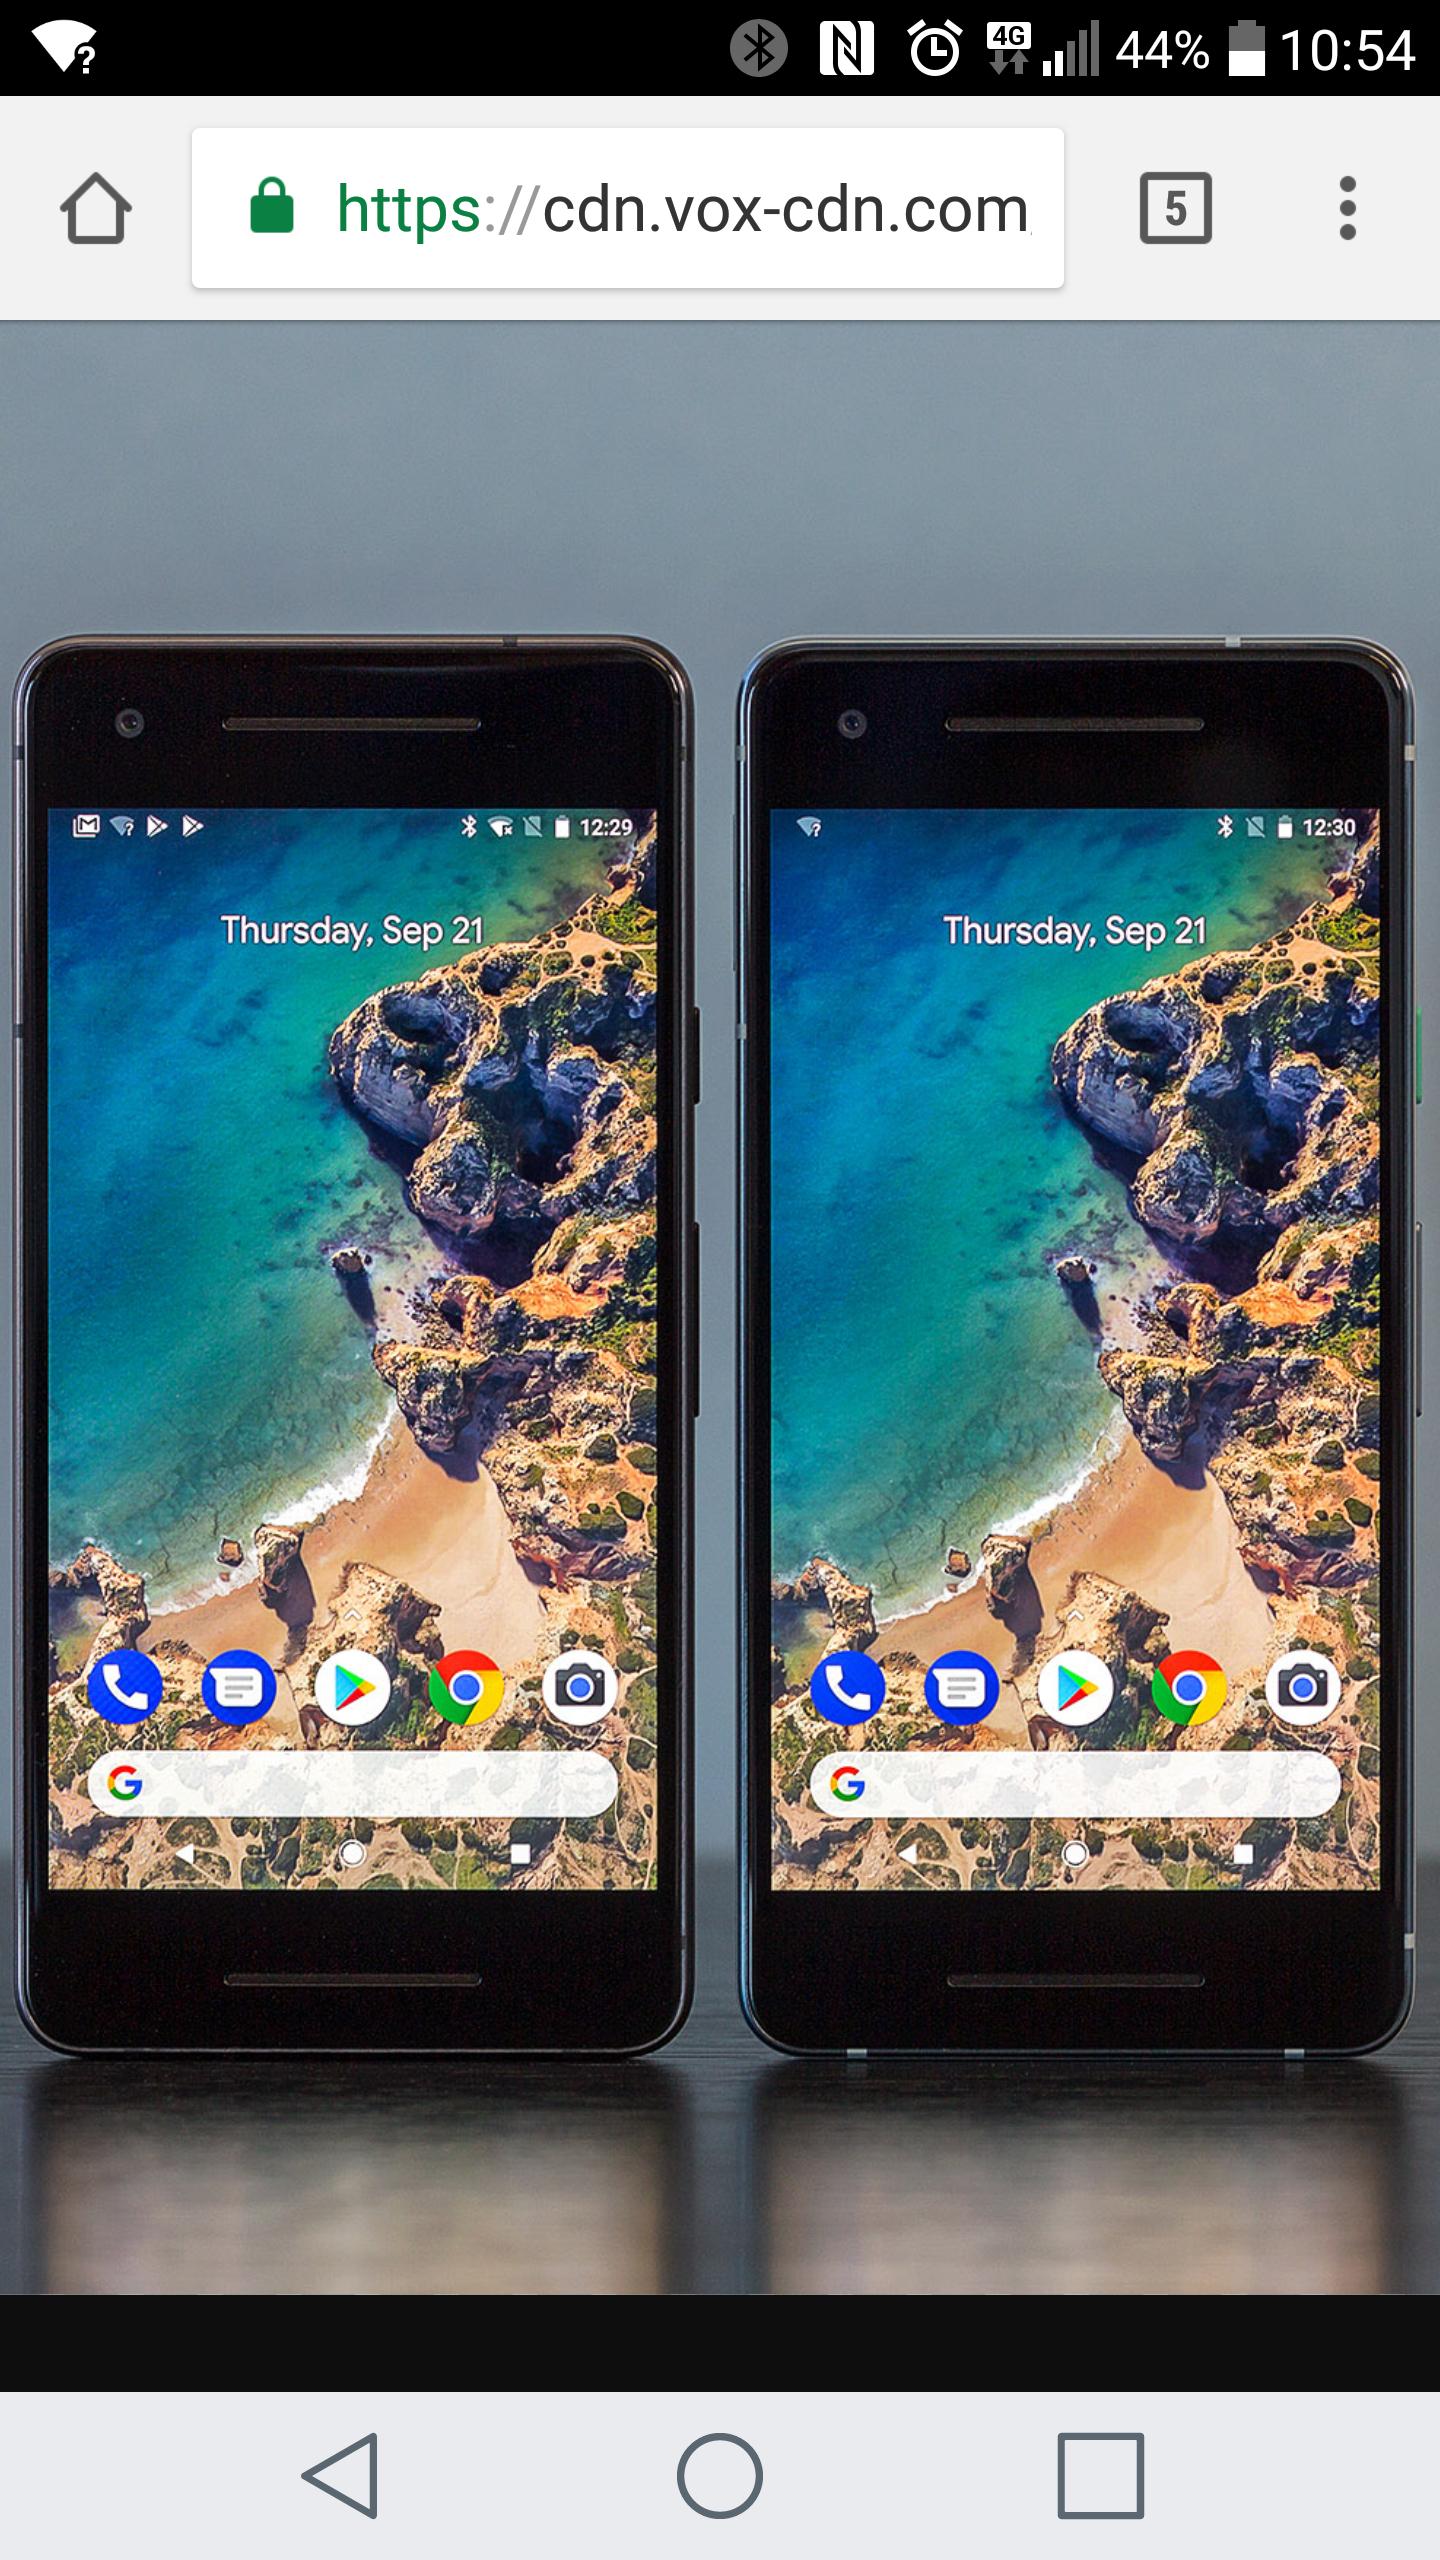 Google Pixel 264GB + free google home mini speaker £22.99 a month EE £75 upfront - mobiles.co.uk